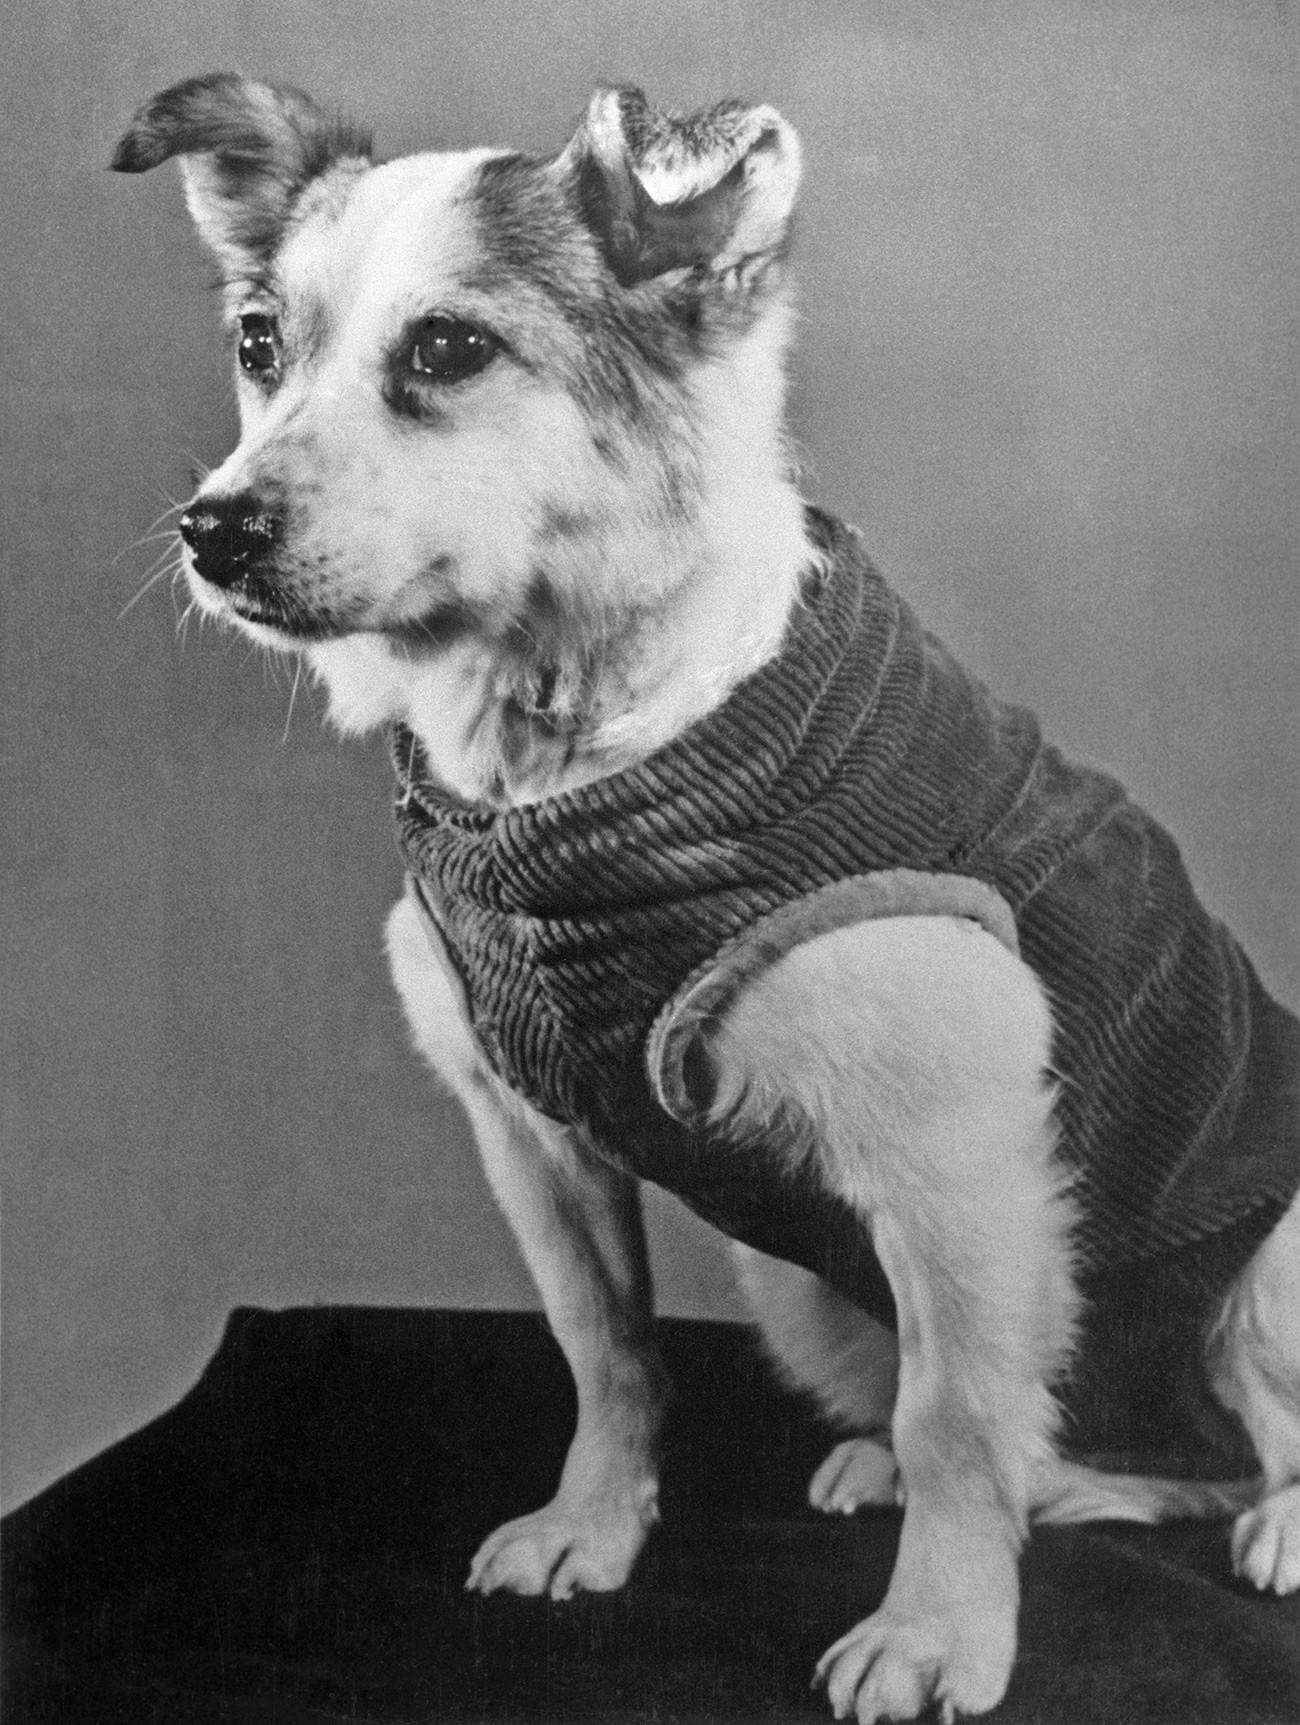 Zvezdochka, anjing yang membuka jalan bagi kemenangan misi bersejarah Yuri Gagarin.